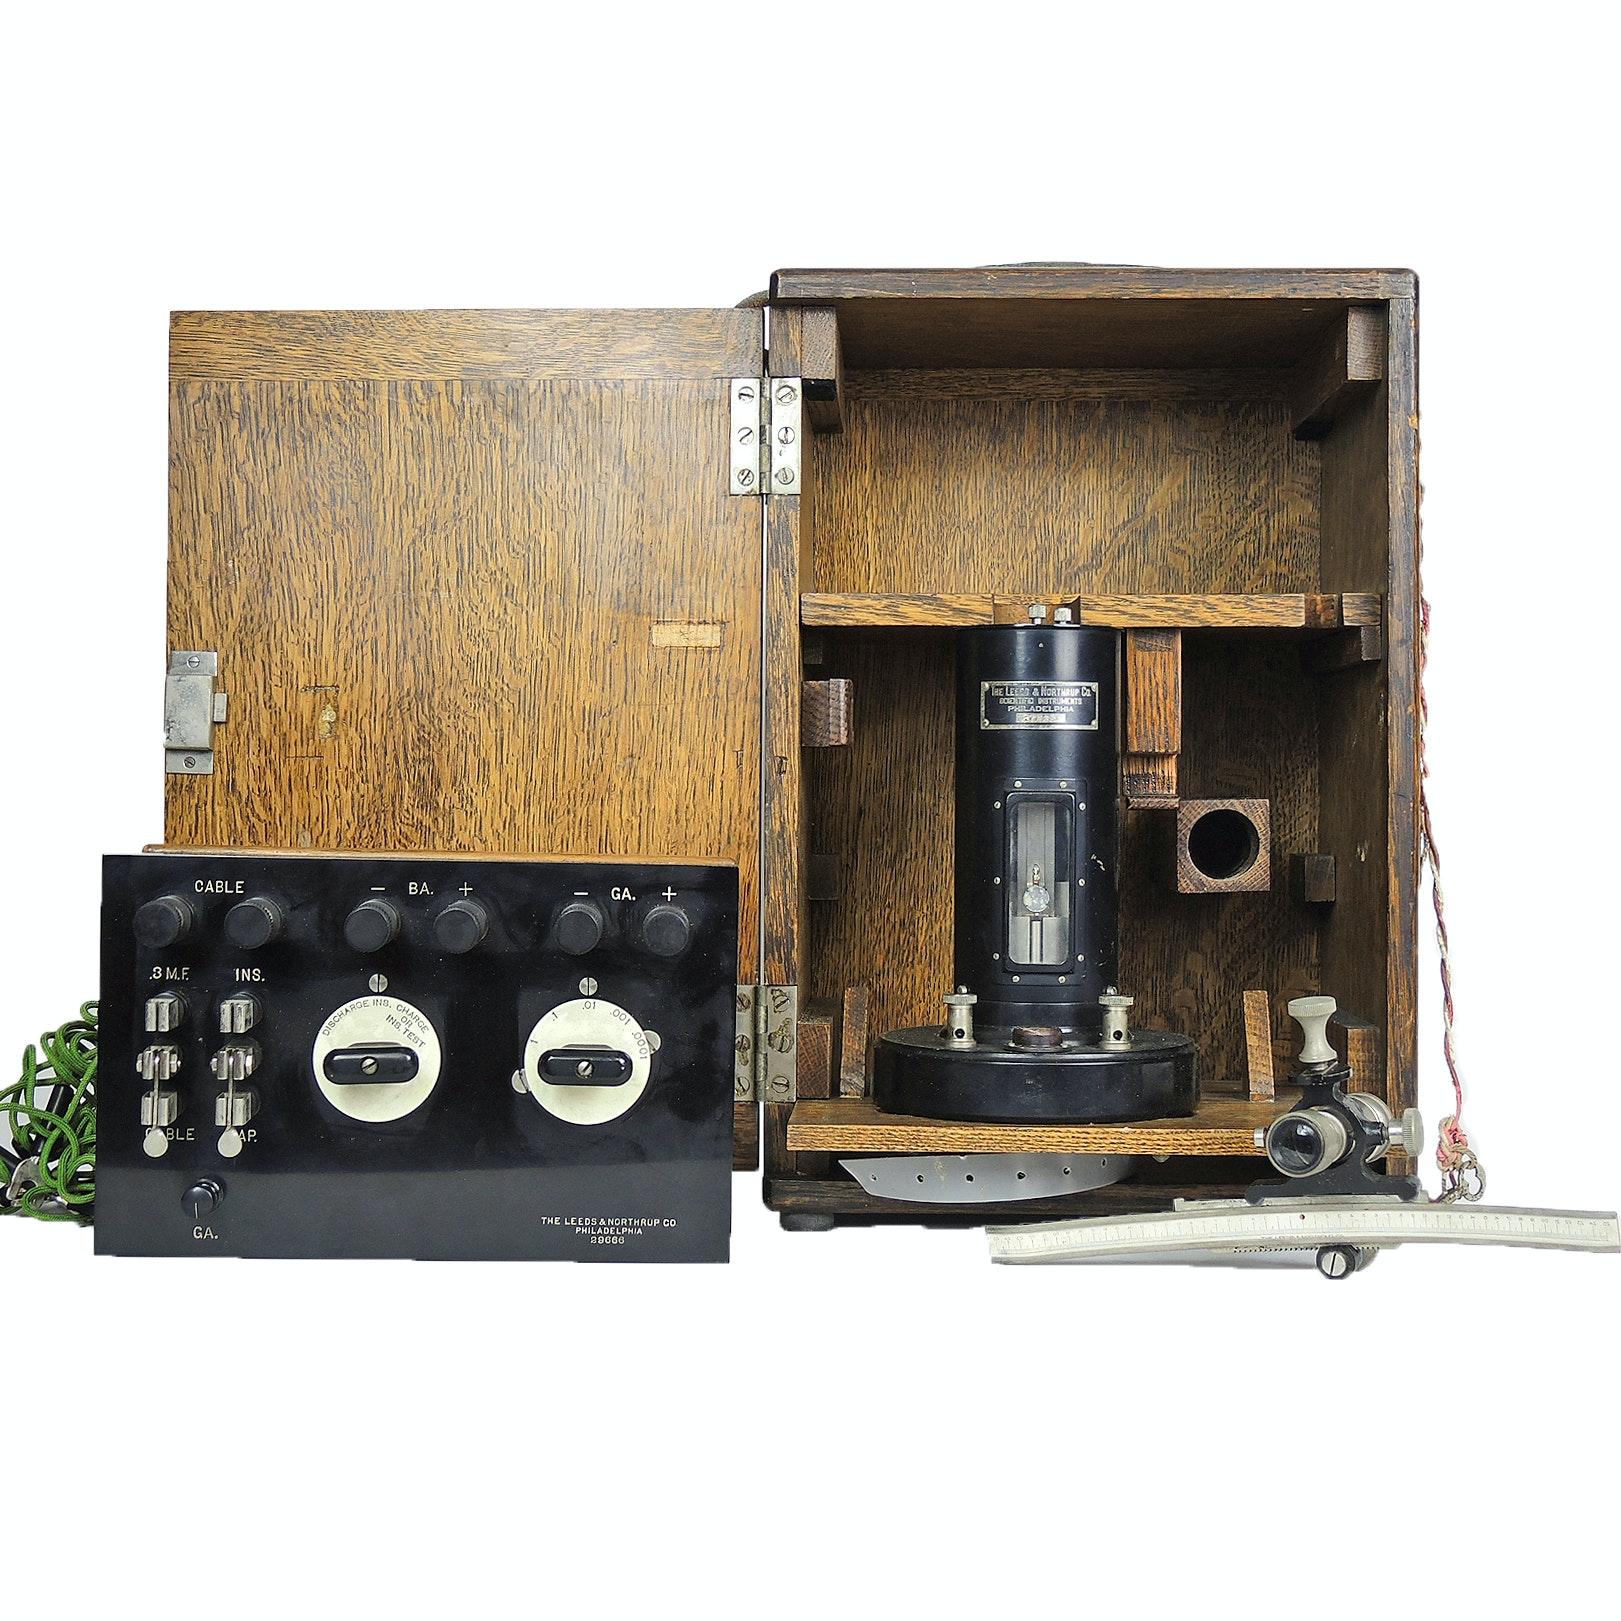 Leeds & Northrup Co. Galvanometer Test Set, Early 20th Century